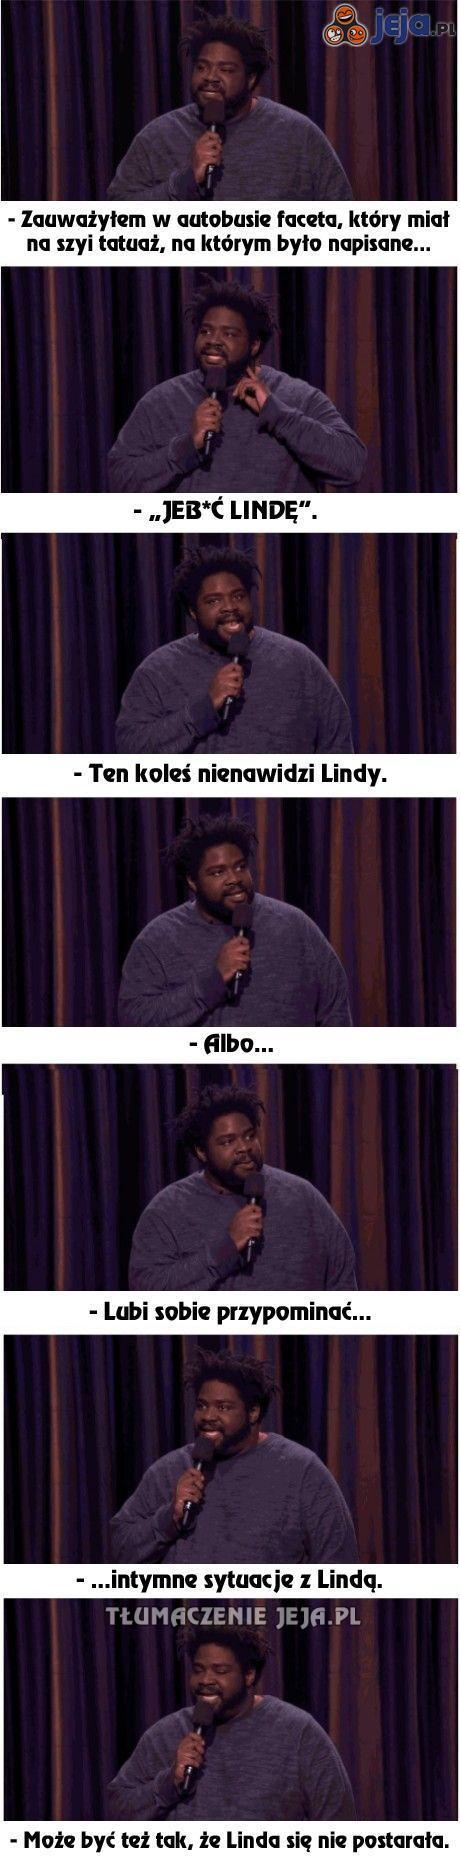 Ech, ta Linda!